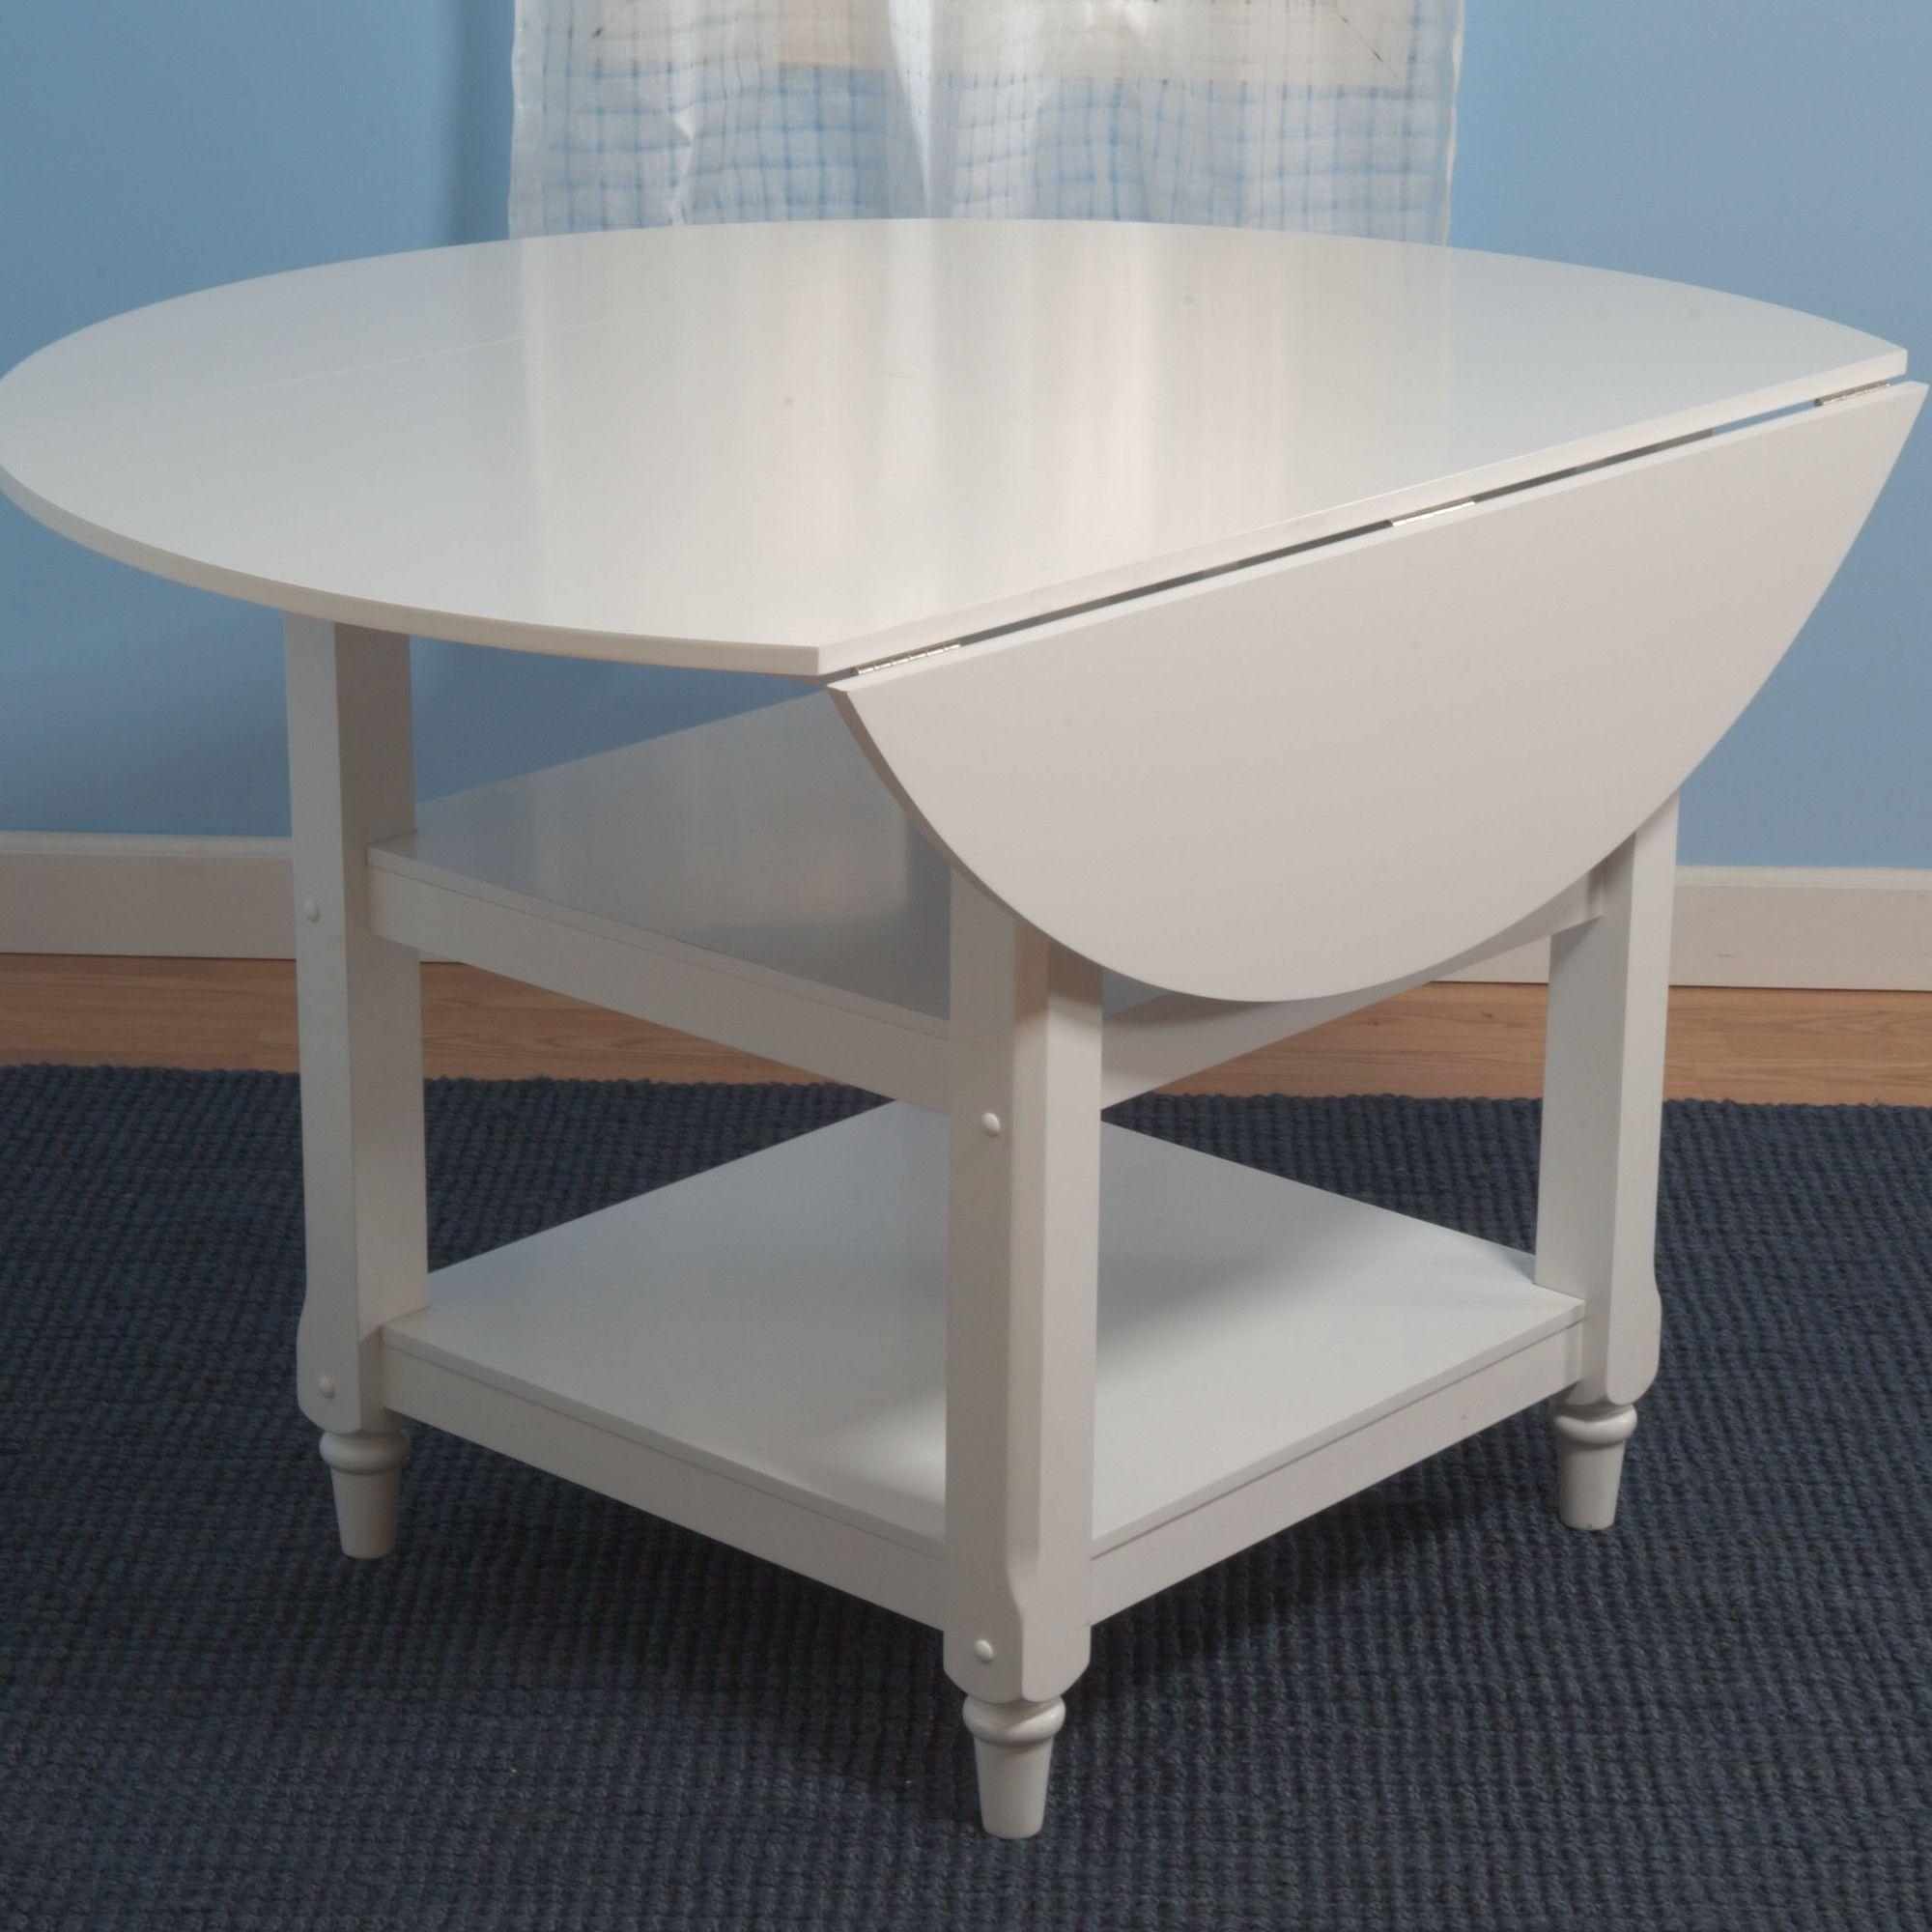 2019 Antique White Shayne Drop-Leaf Kitchen Tables inside Bristol Point Drop Leaf Dining Table In 2019